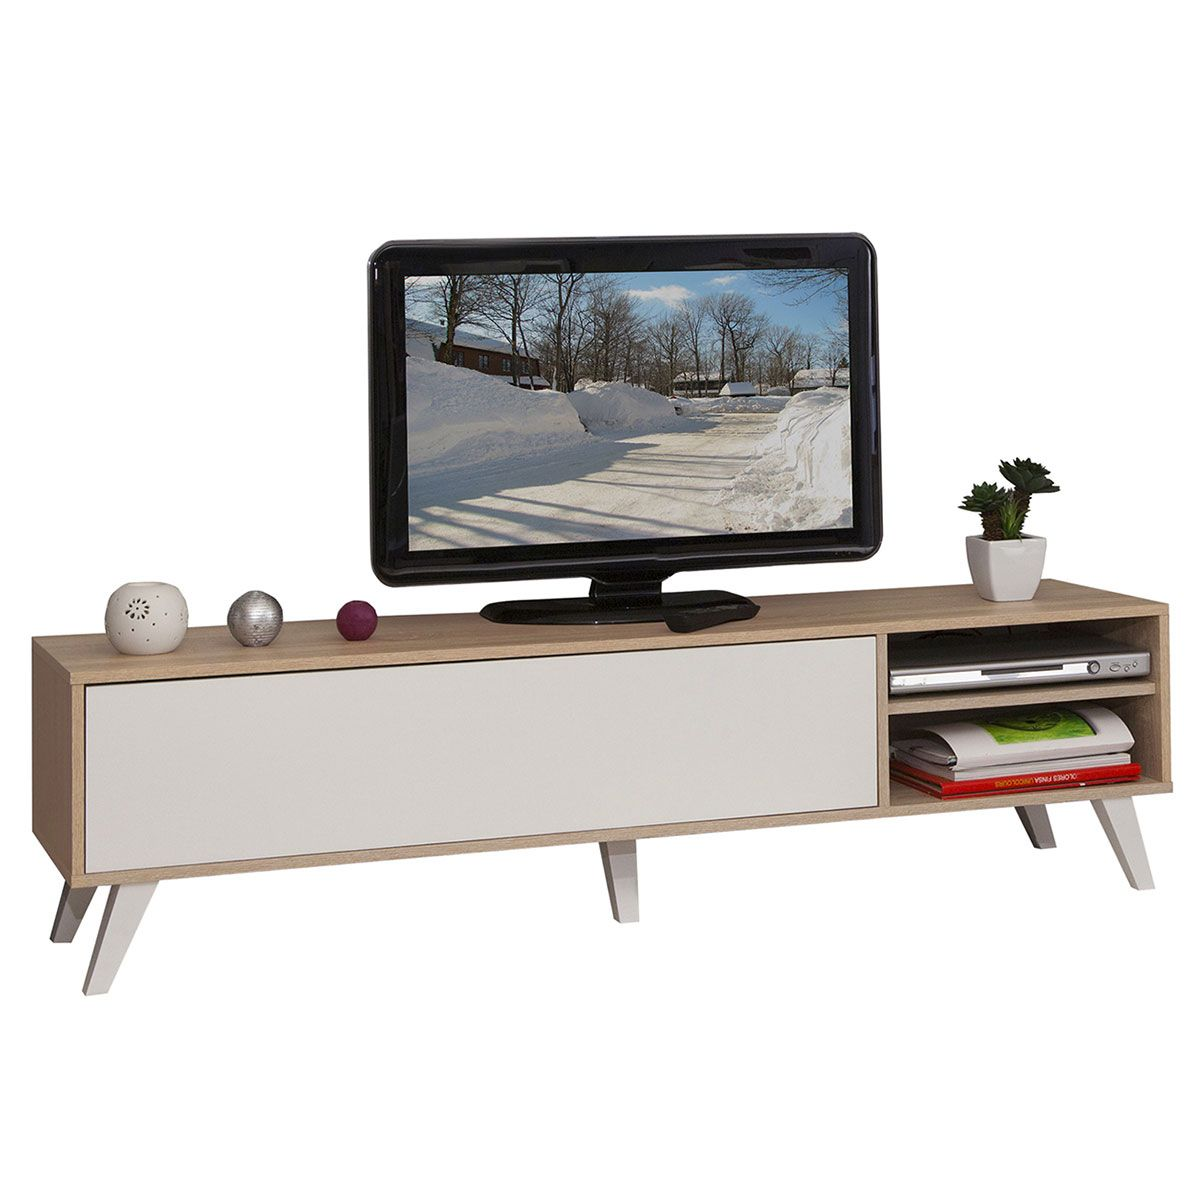 Meuble Tv Conforama Bois Affordable Salon Salle A Manger  # Meuble Tv Pied Bois